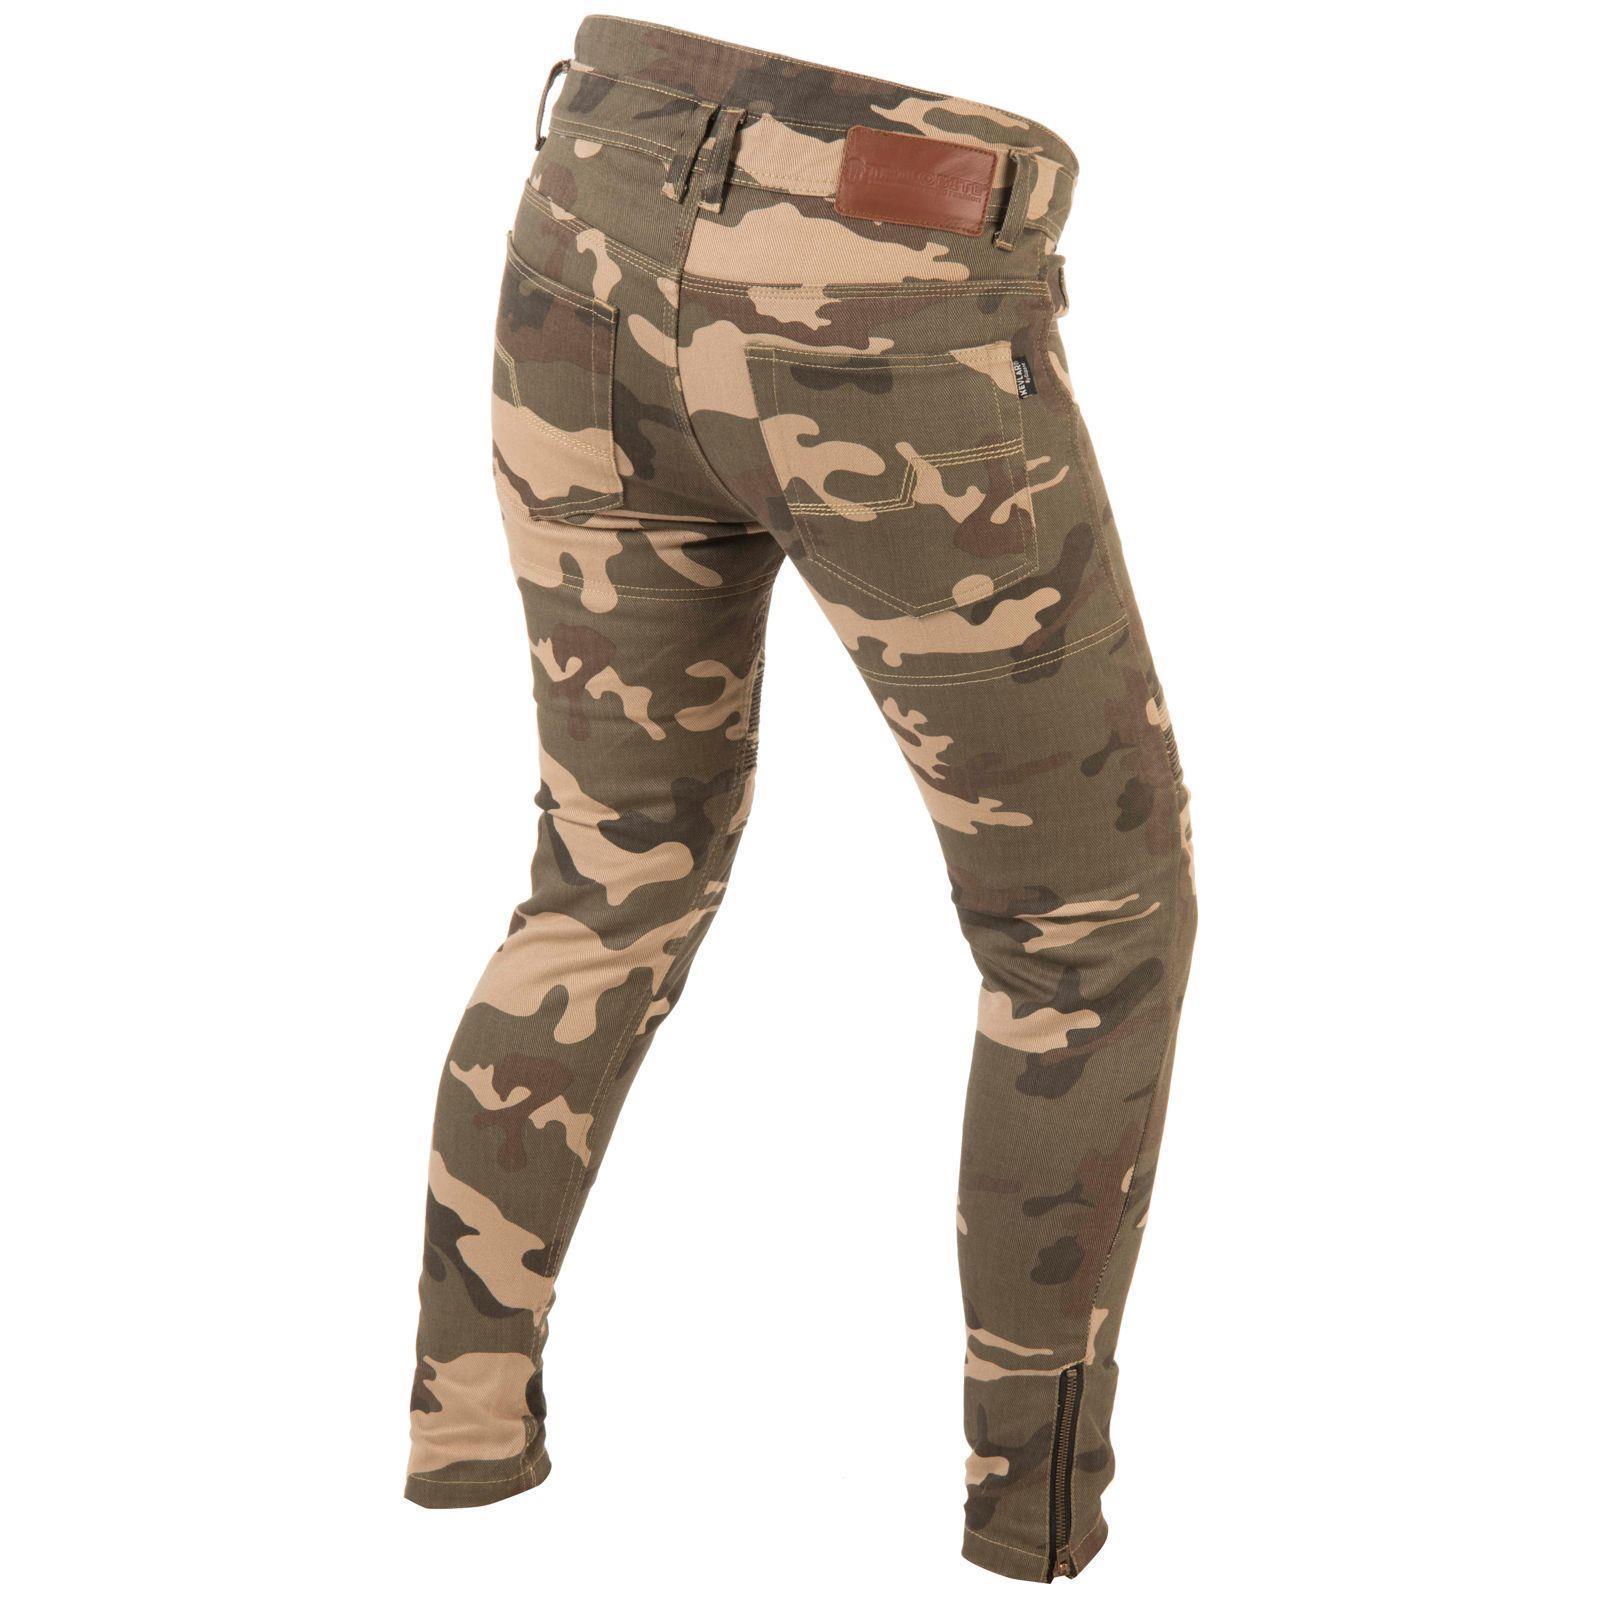 Trilobite-Pantaloni-Moto-Jeans-Abbigliamento-Parado-MICAS-URBAN-DUAL-PANTS-ACID miniatura 100